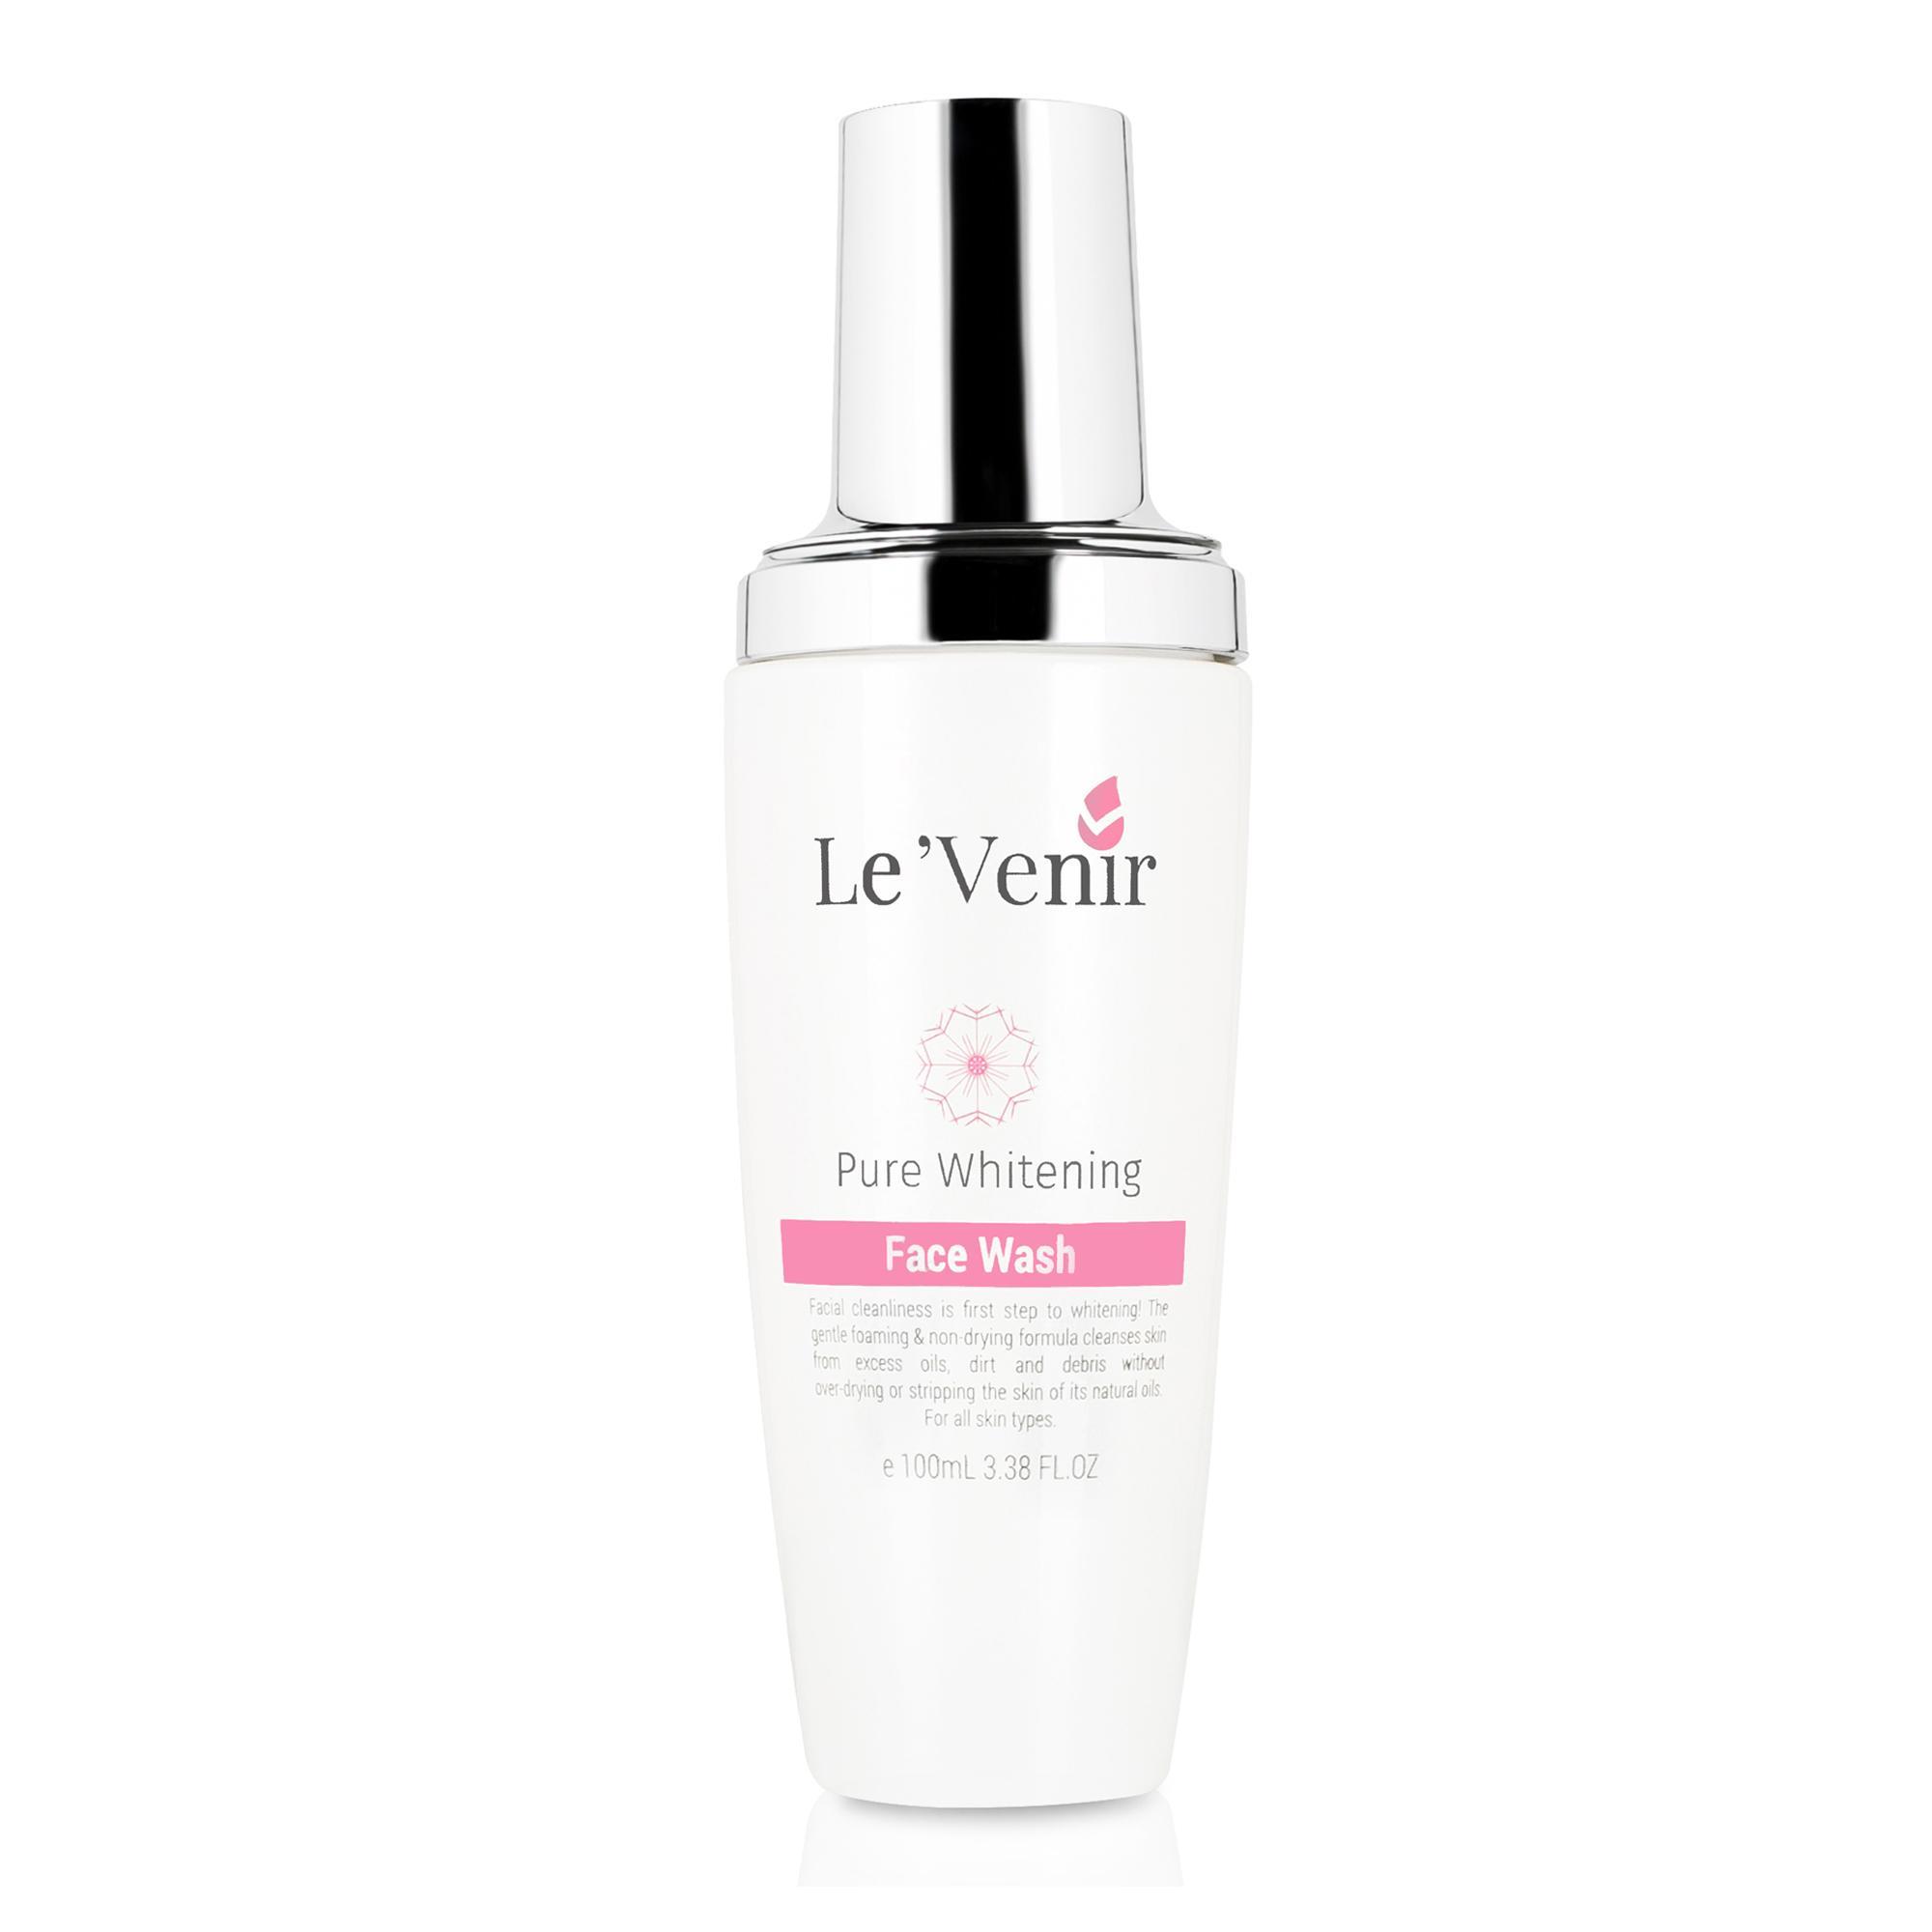 Le Venir Pure Whitening Face Wash 15 ml. ราคาส่งถูกๆ W.290 รหัส TM910